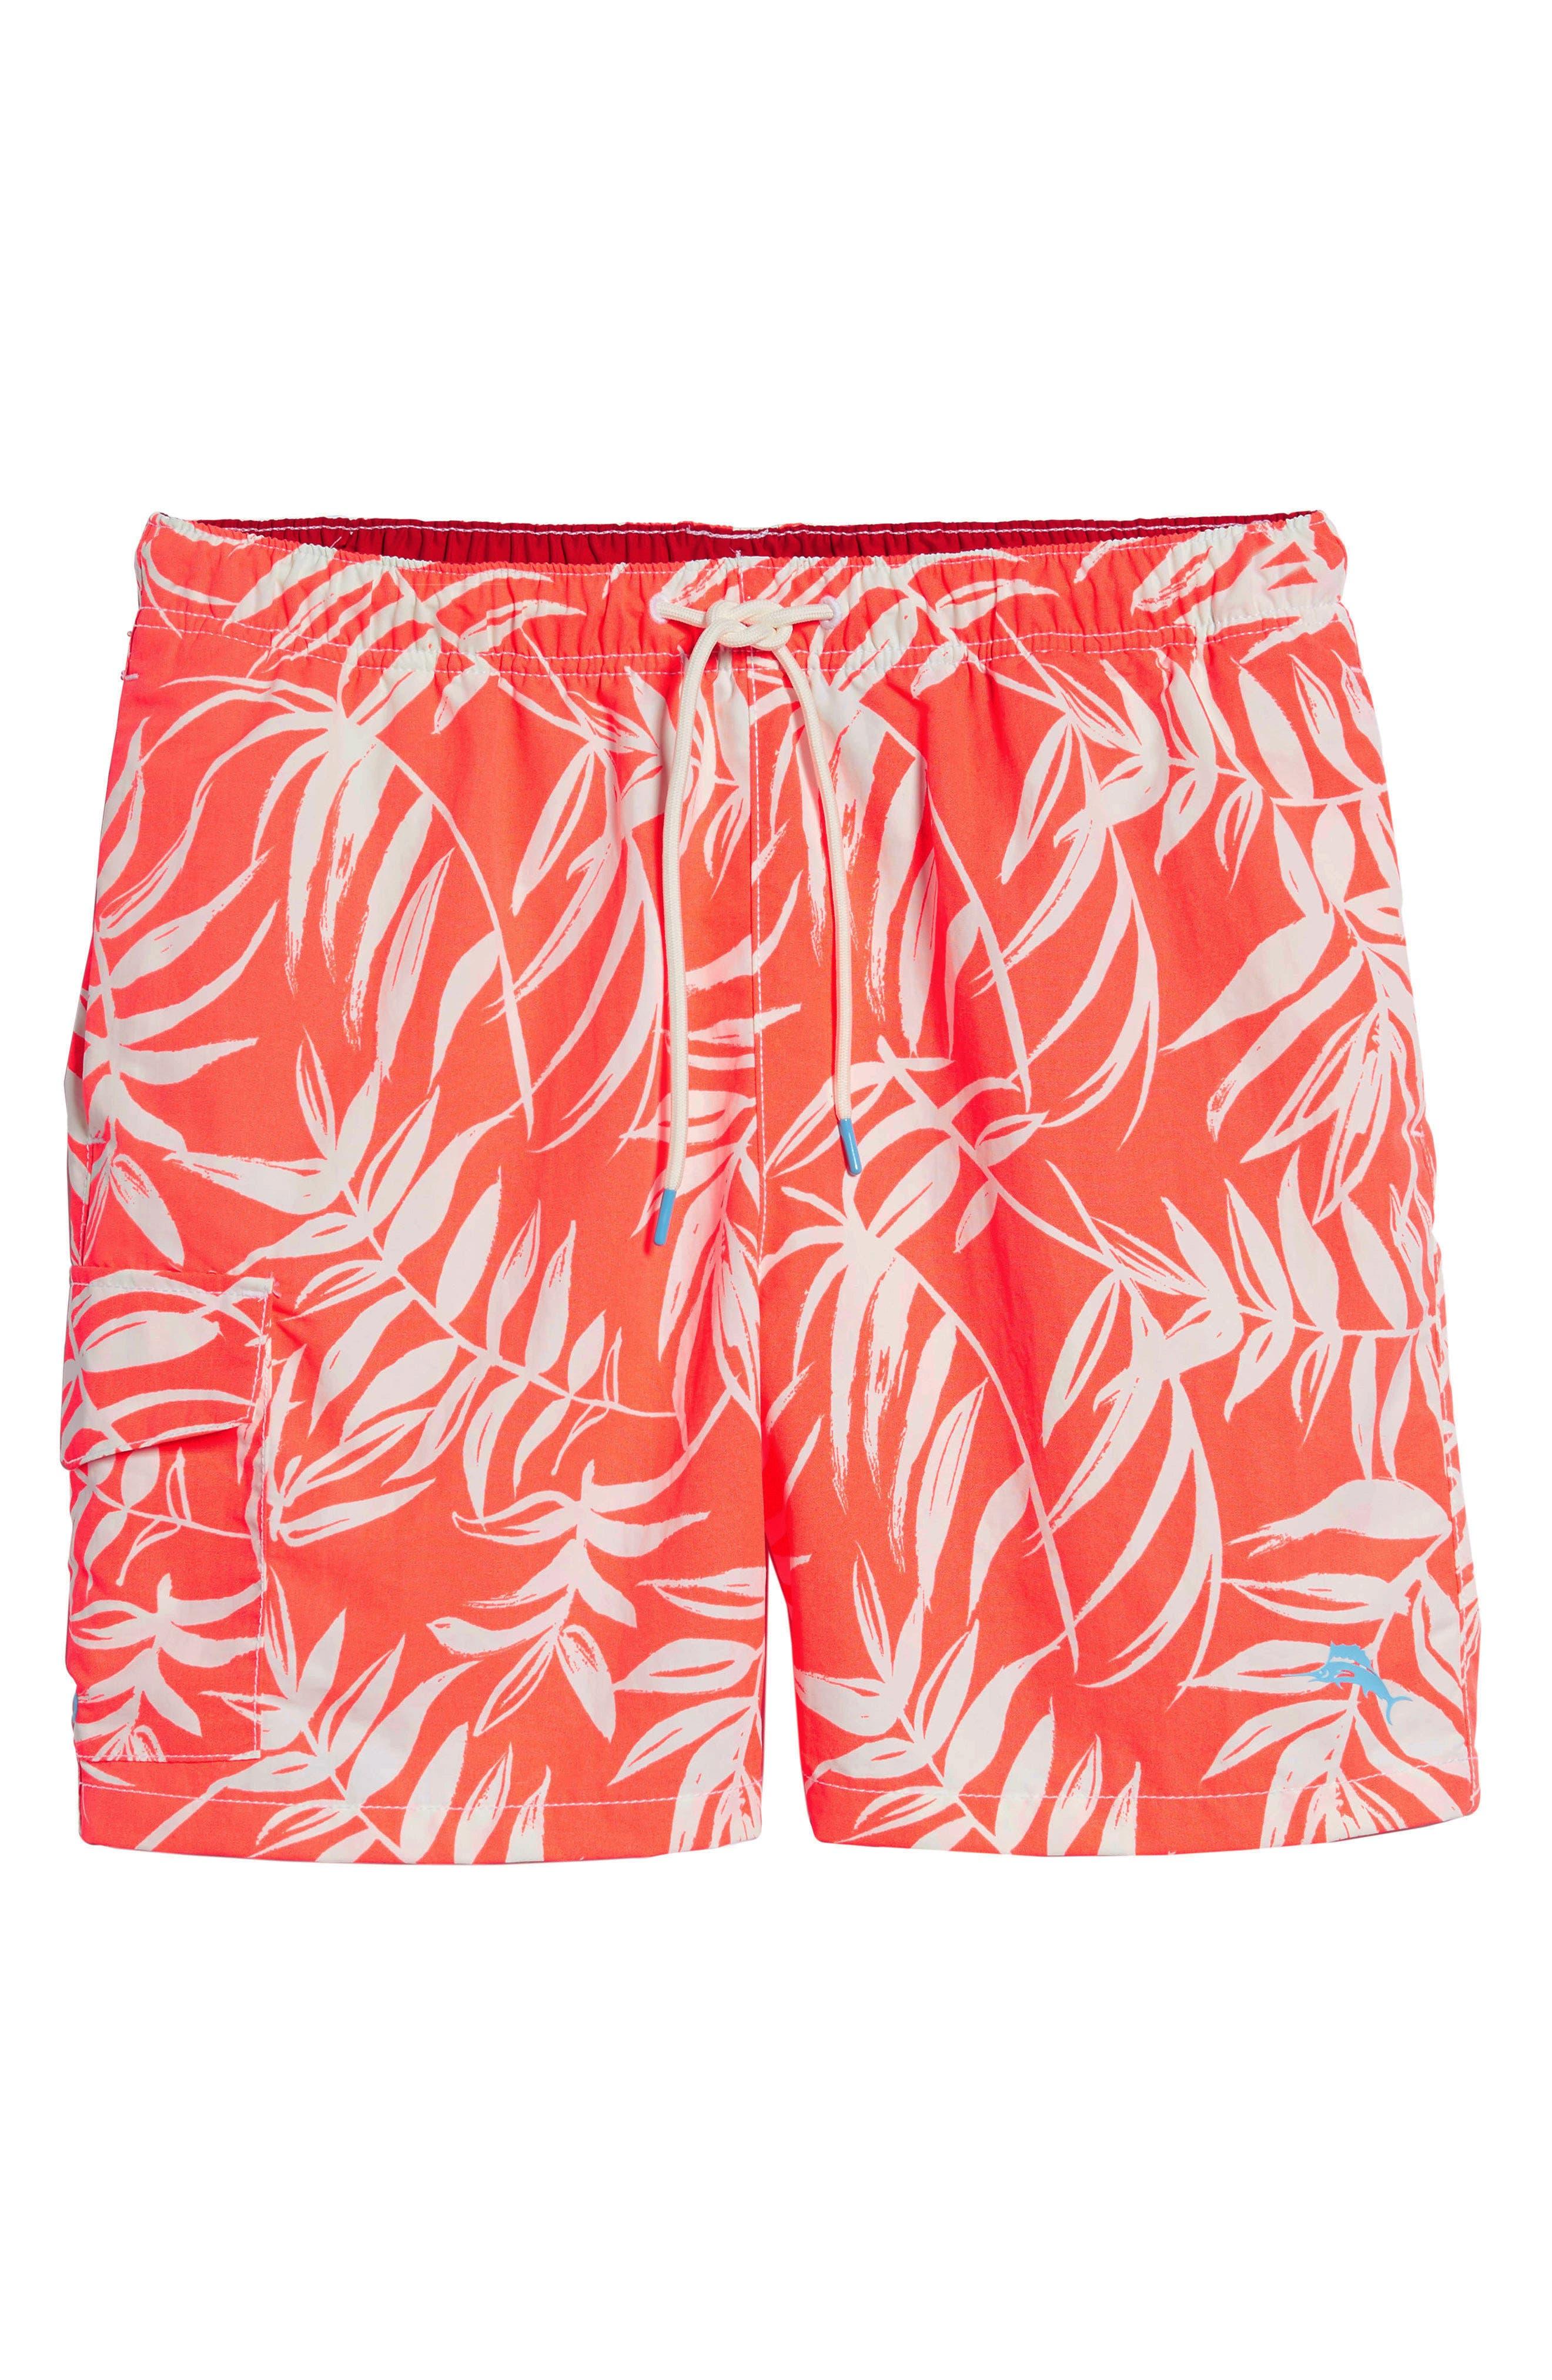 Naples Muy Caliente Swim Trunks,                             Alternate thumbnail 6, color,                             800